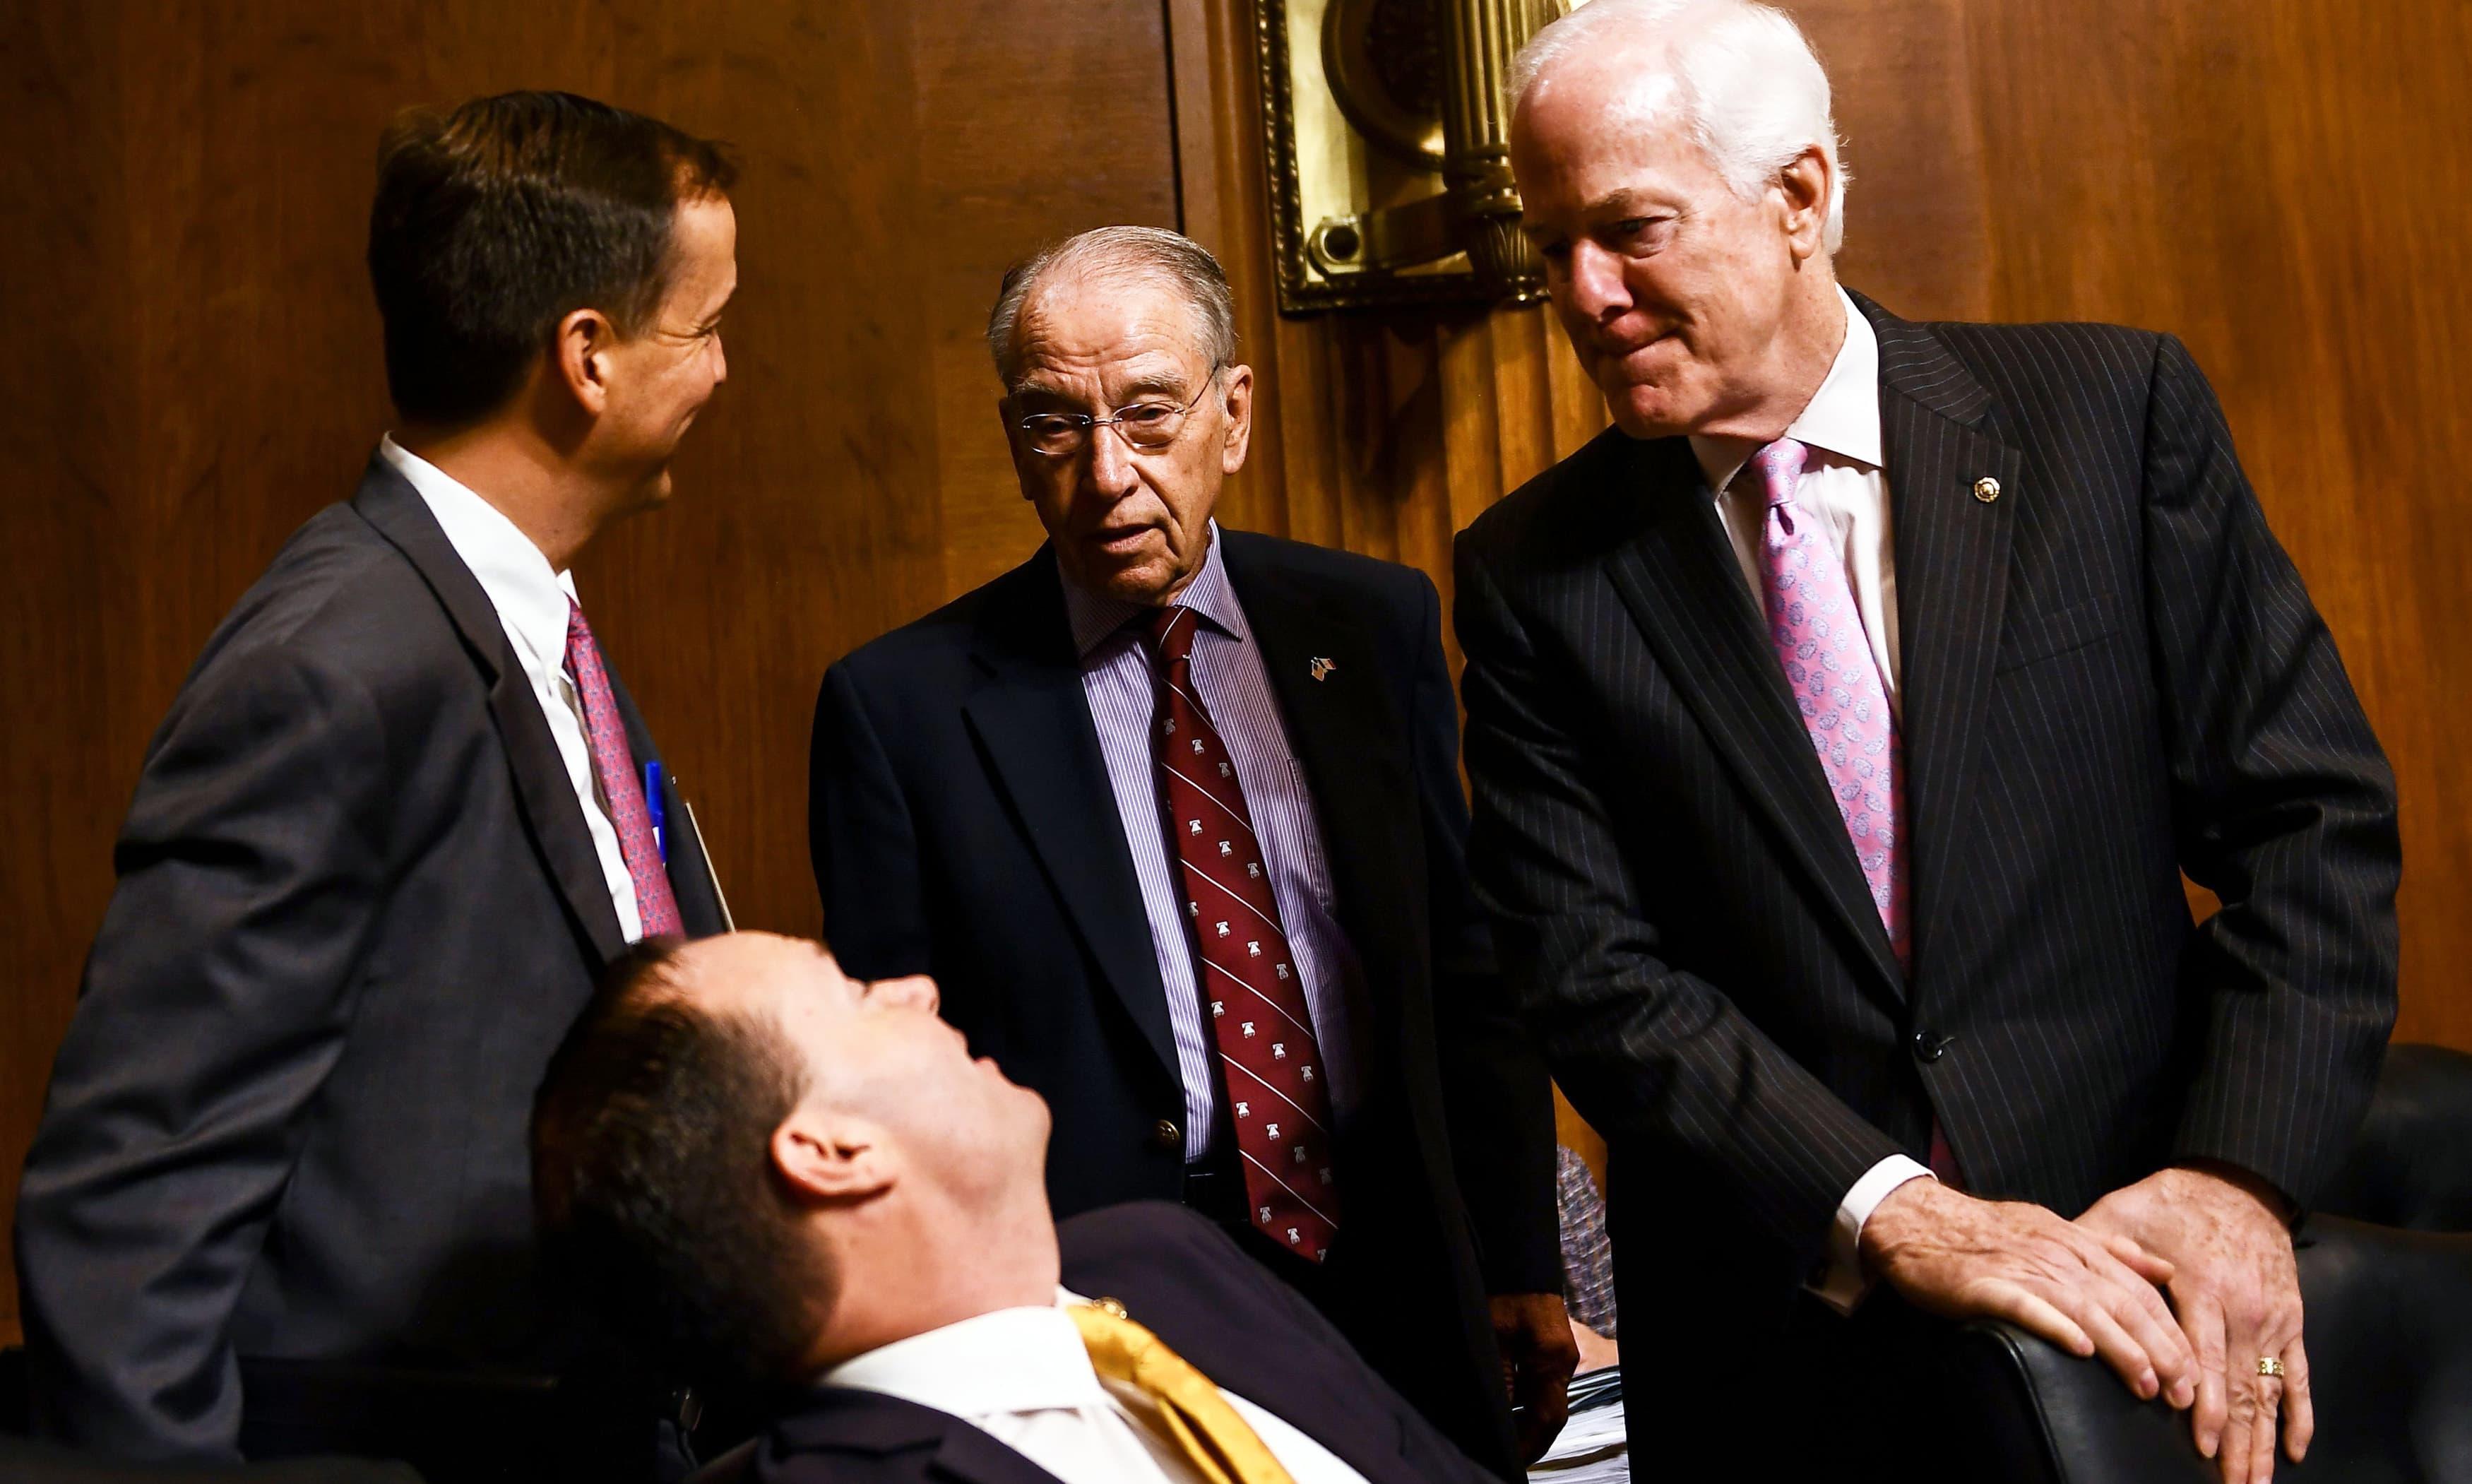 GOP agrees to FBI probe of Trump's Supreme Court pick Kavanaugh, delaying Senate vote